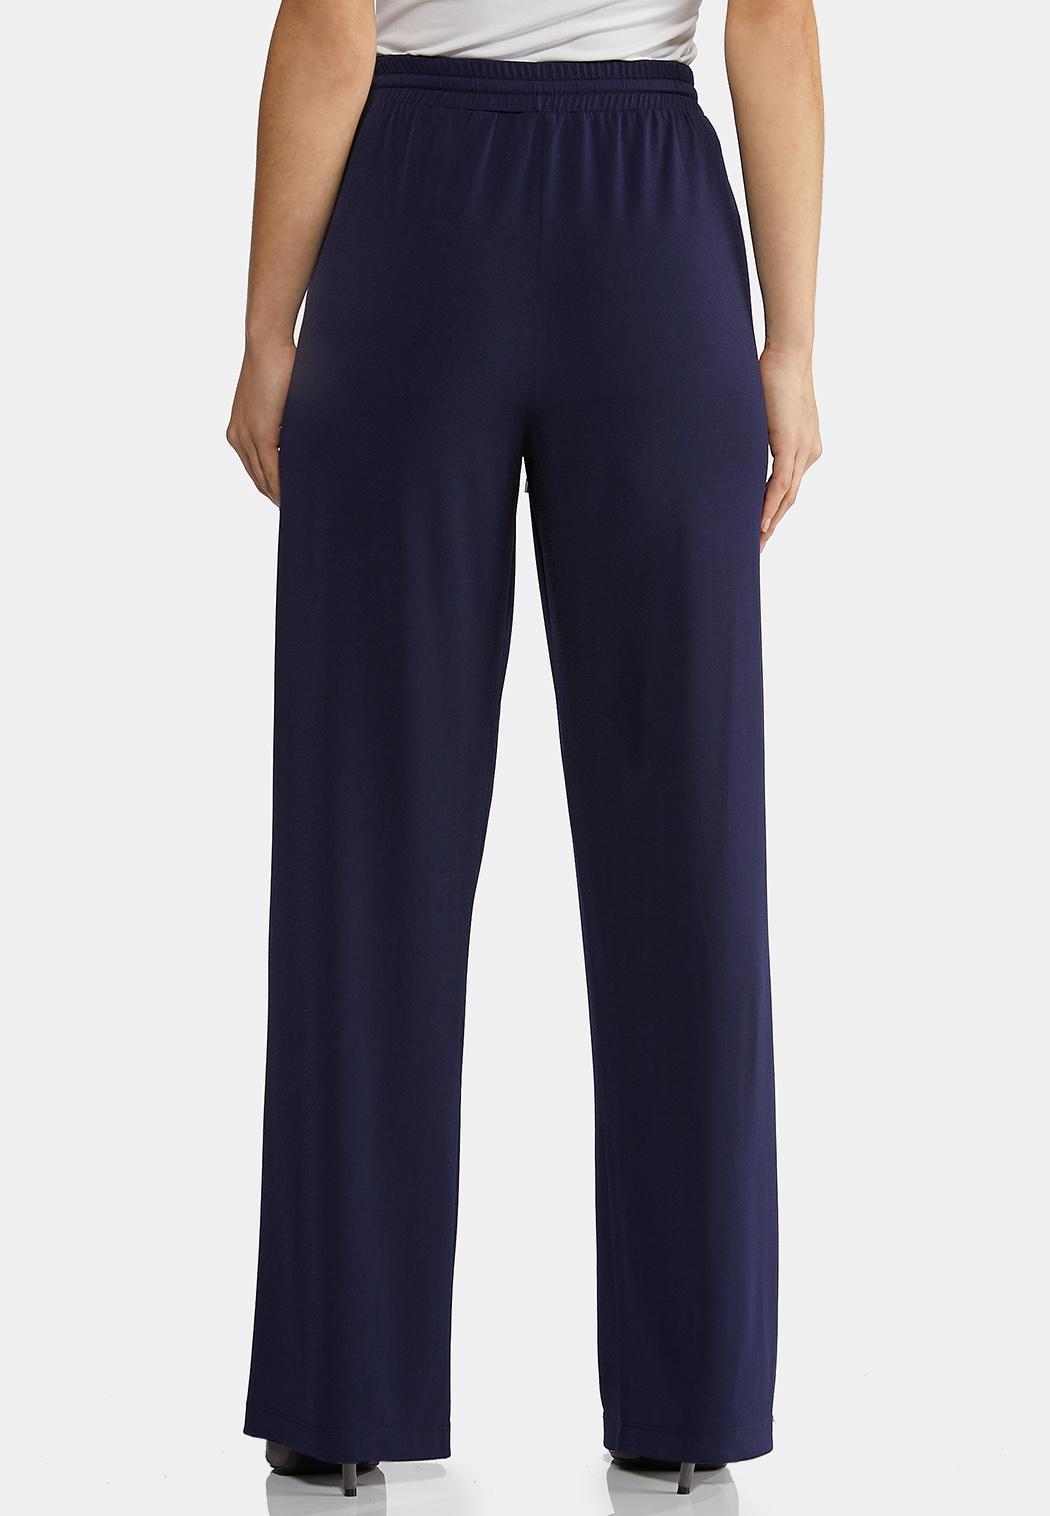 Petite Solid Wide Leg Pants (Item #44145563)